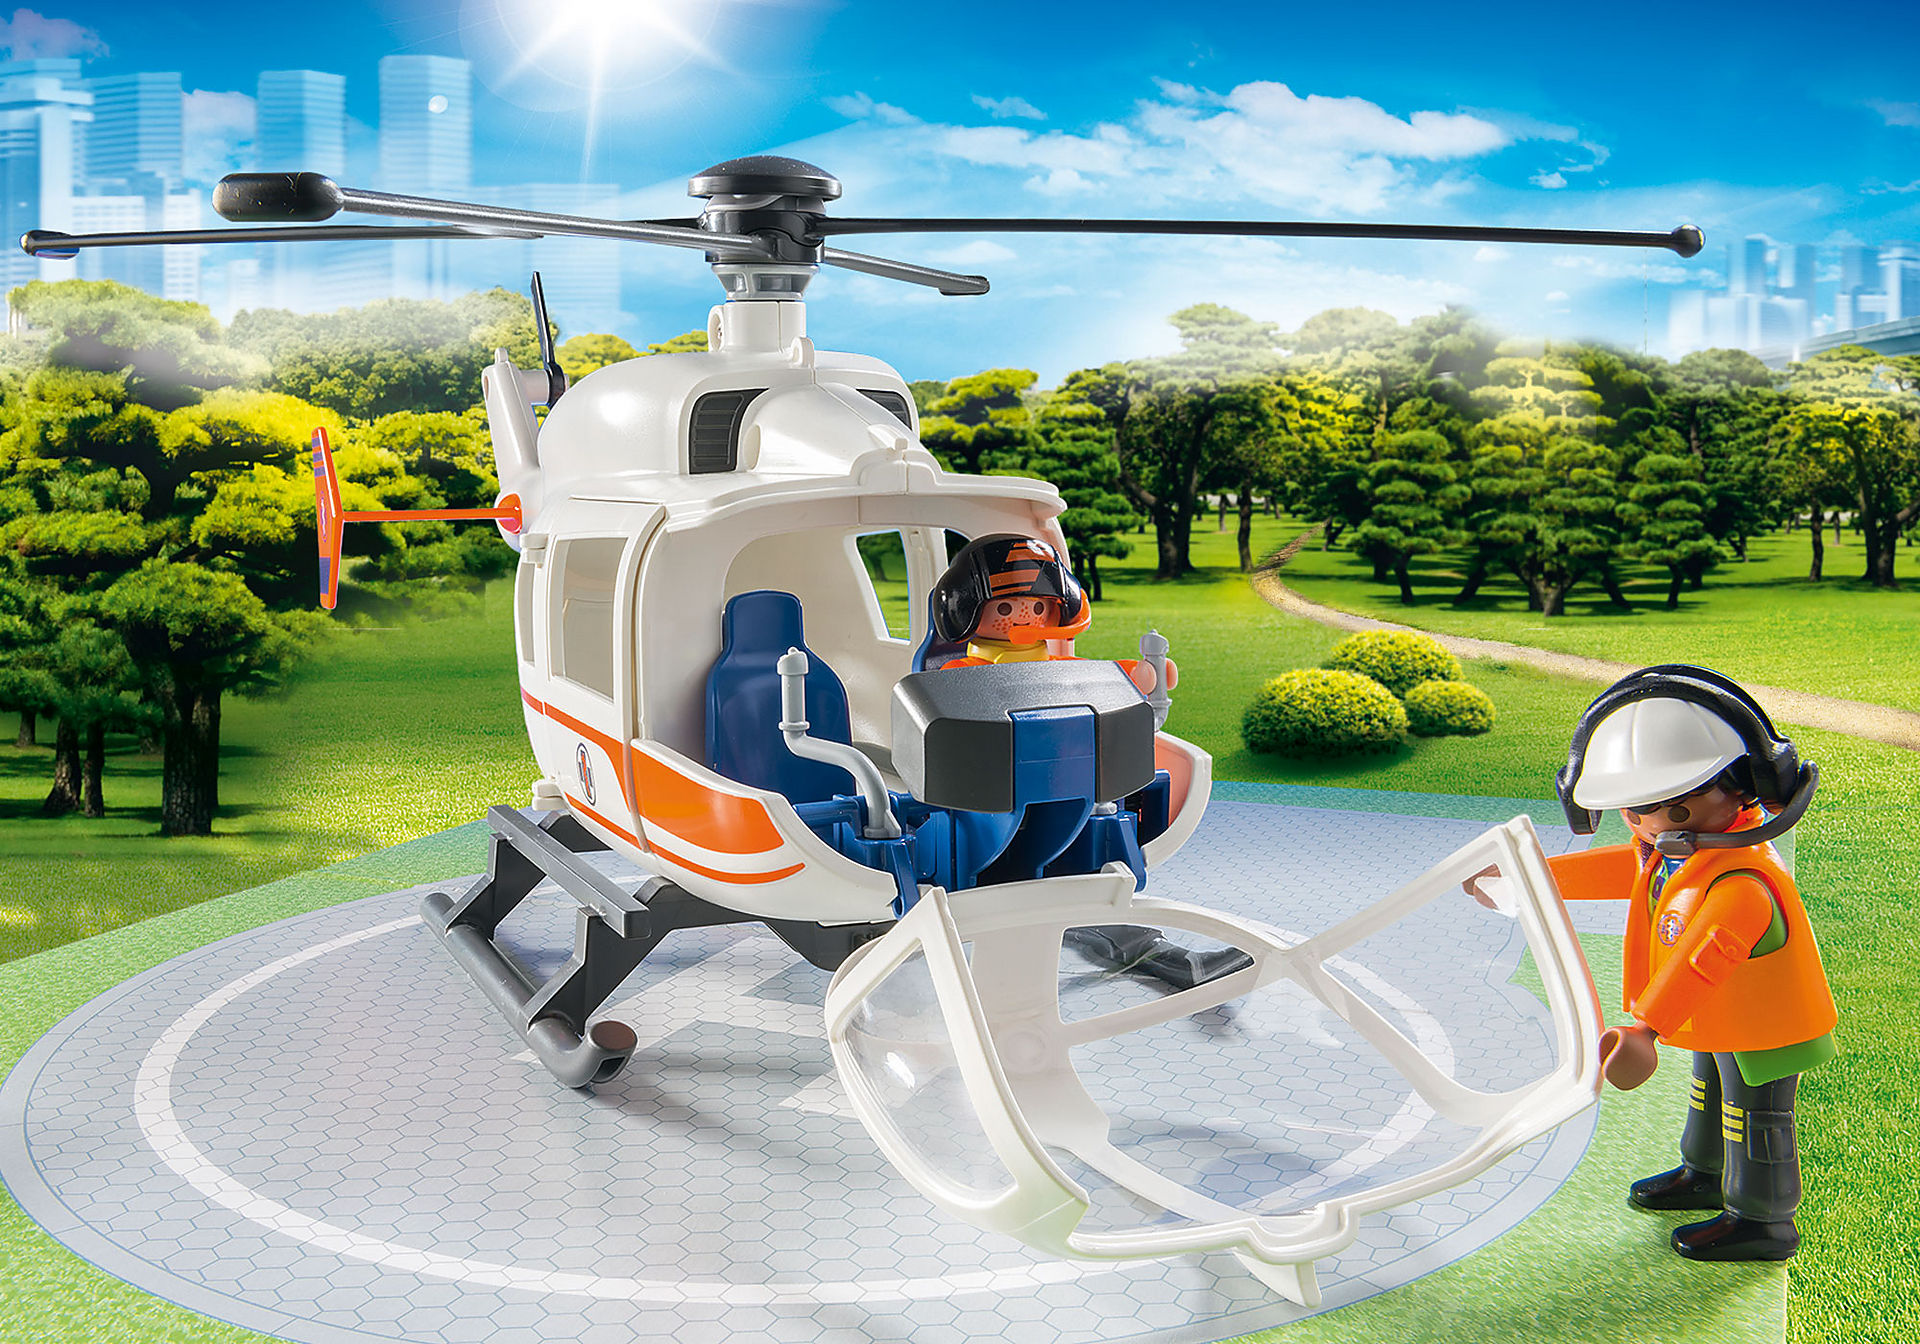 70048 Rettungshelikopter zoom image5